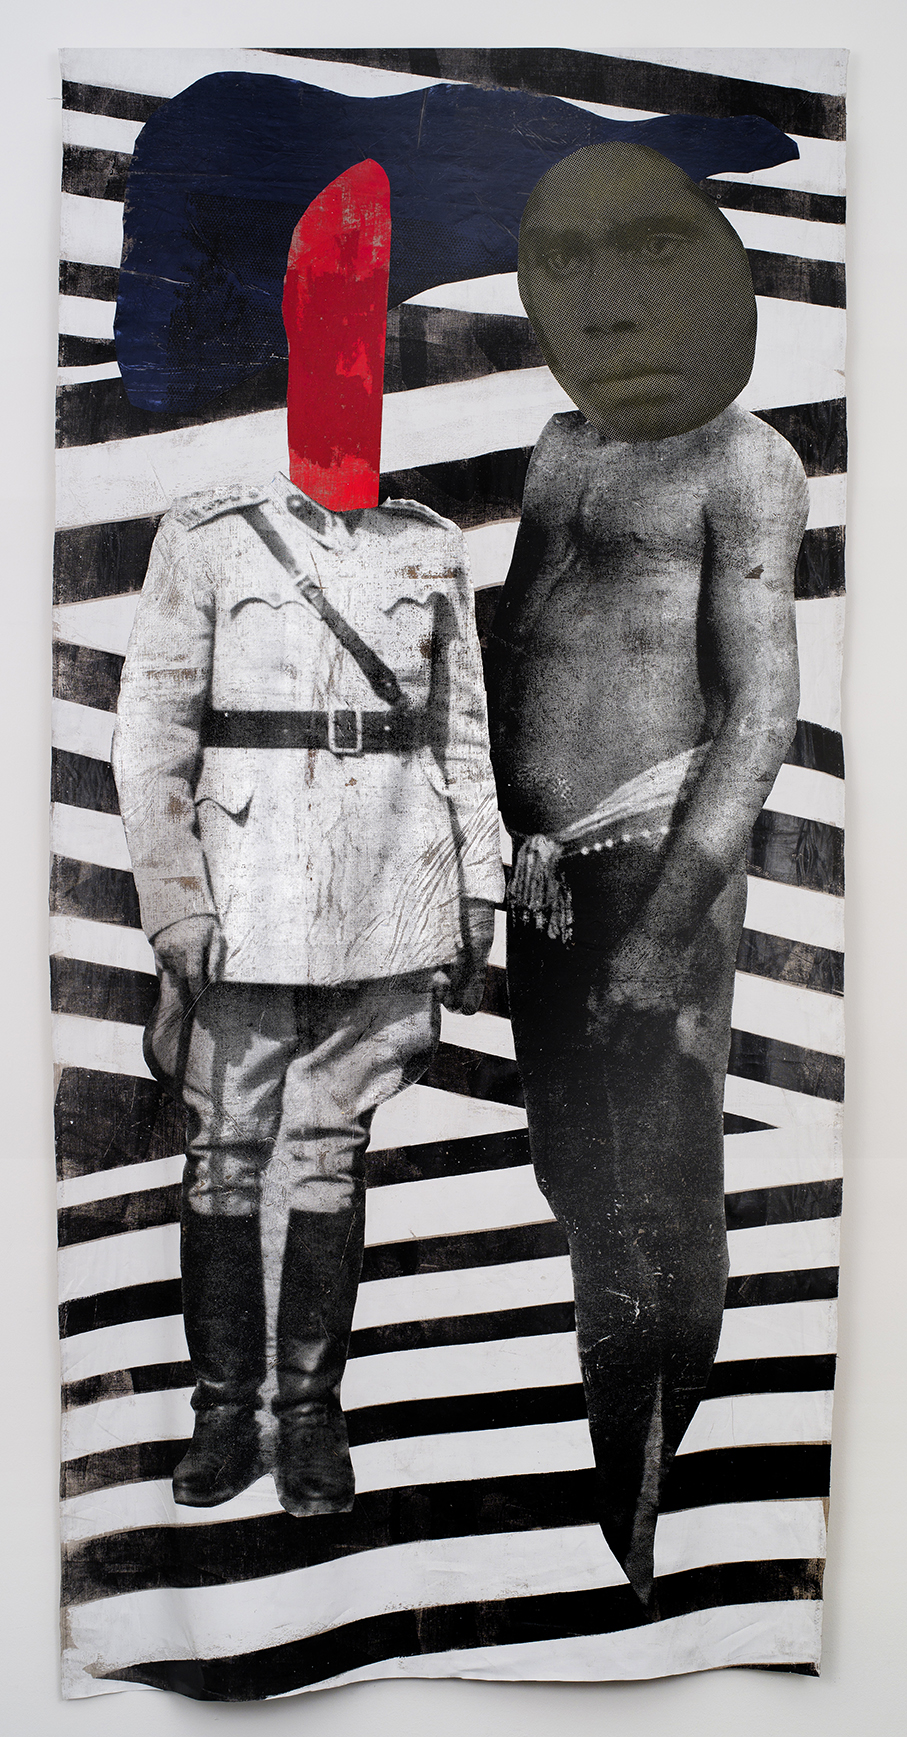 The Forest,  2016  Linen, acrylic ink, oil pastels, foil, wood  303 x 150 x 6 cm